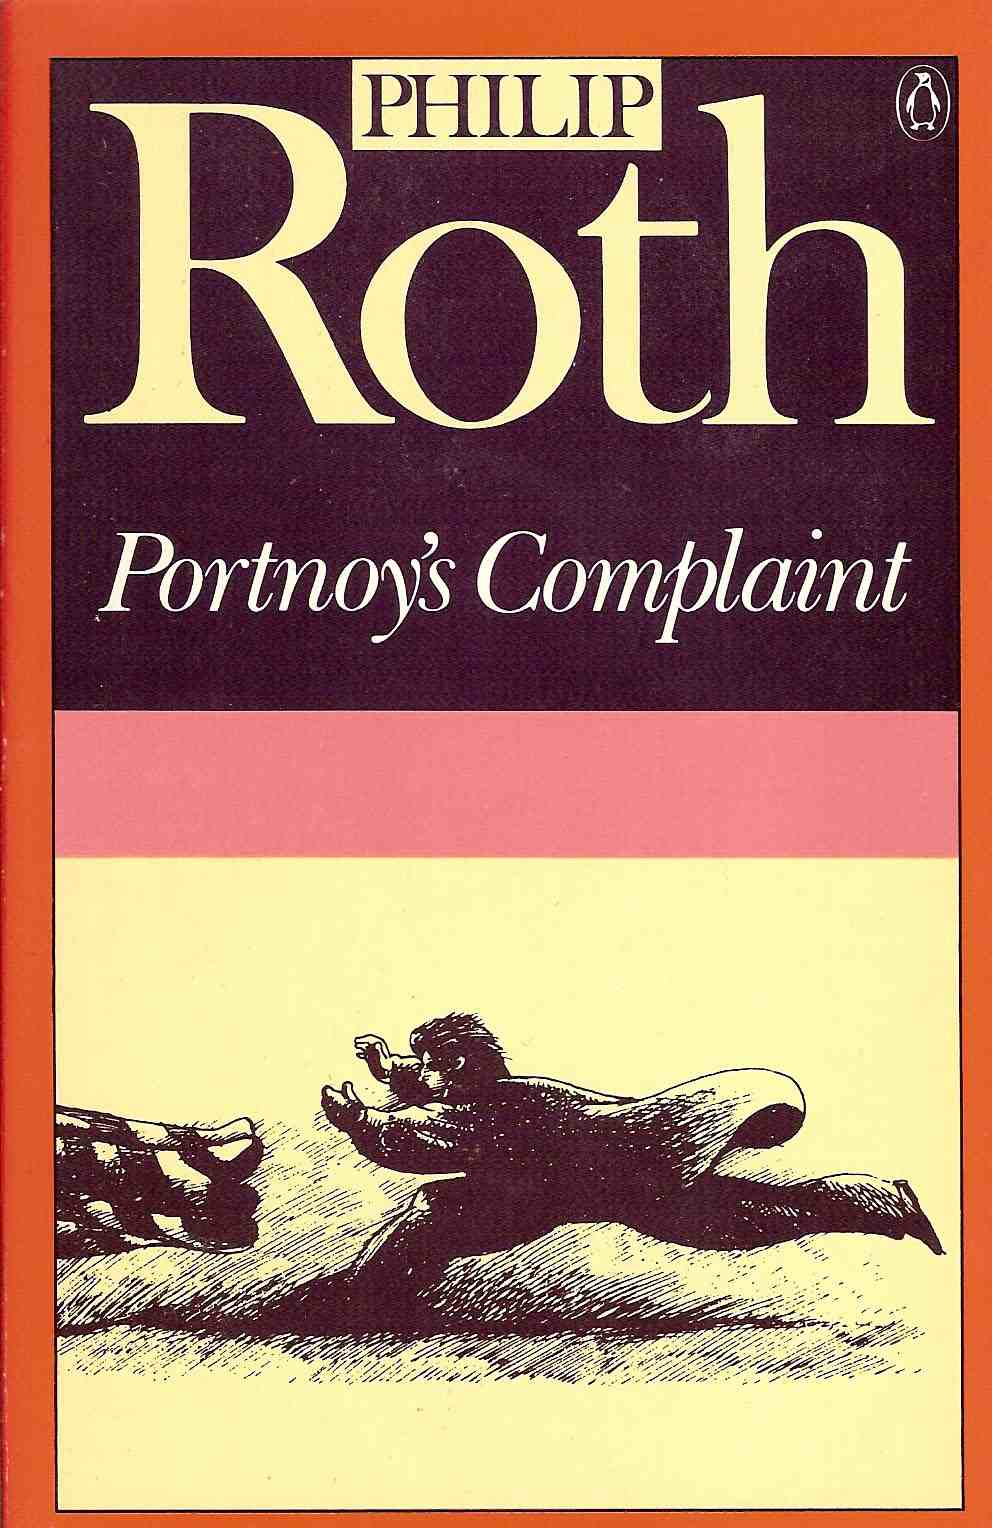 Portnoy's+Complaint